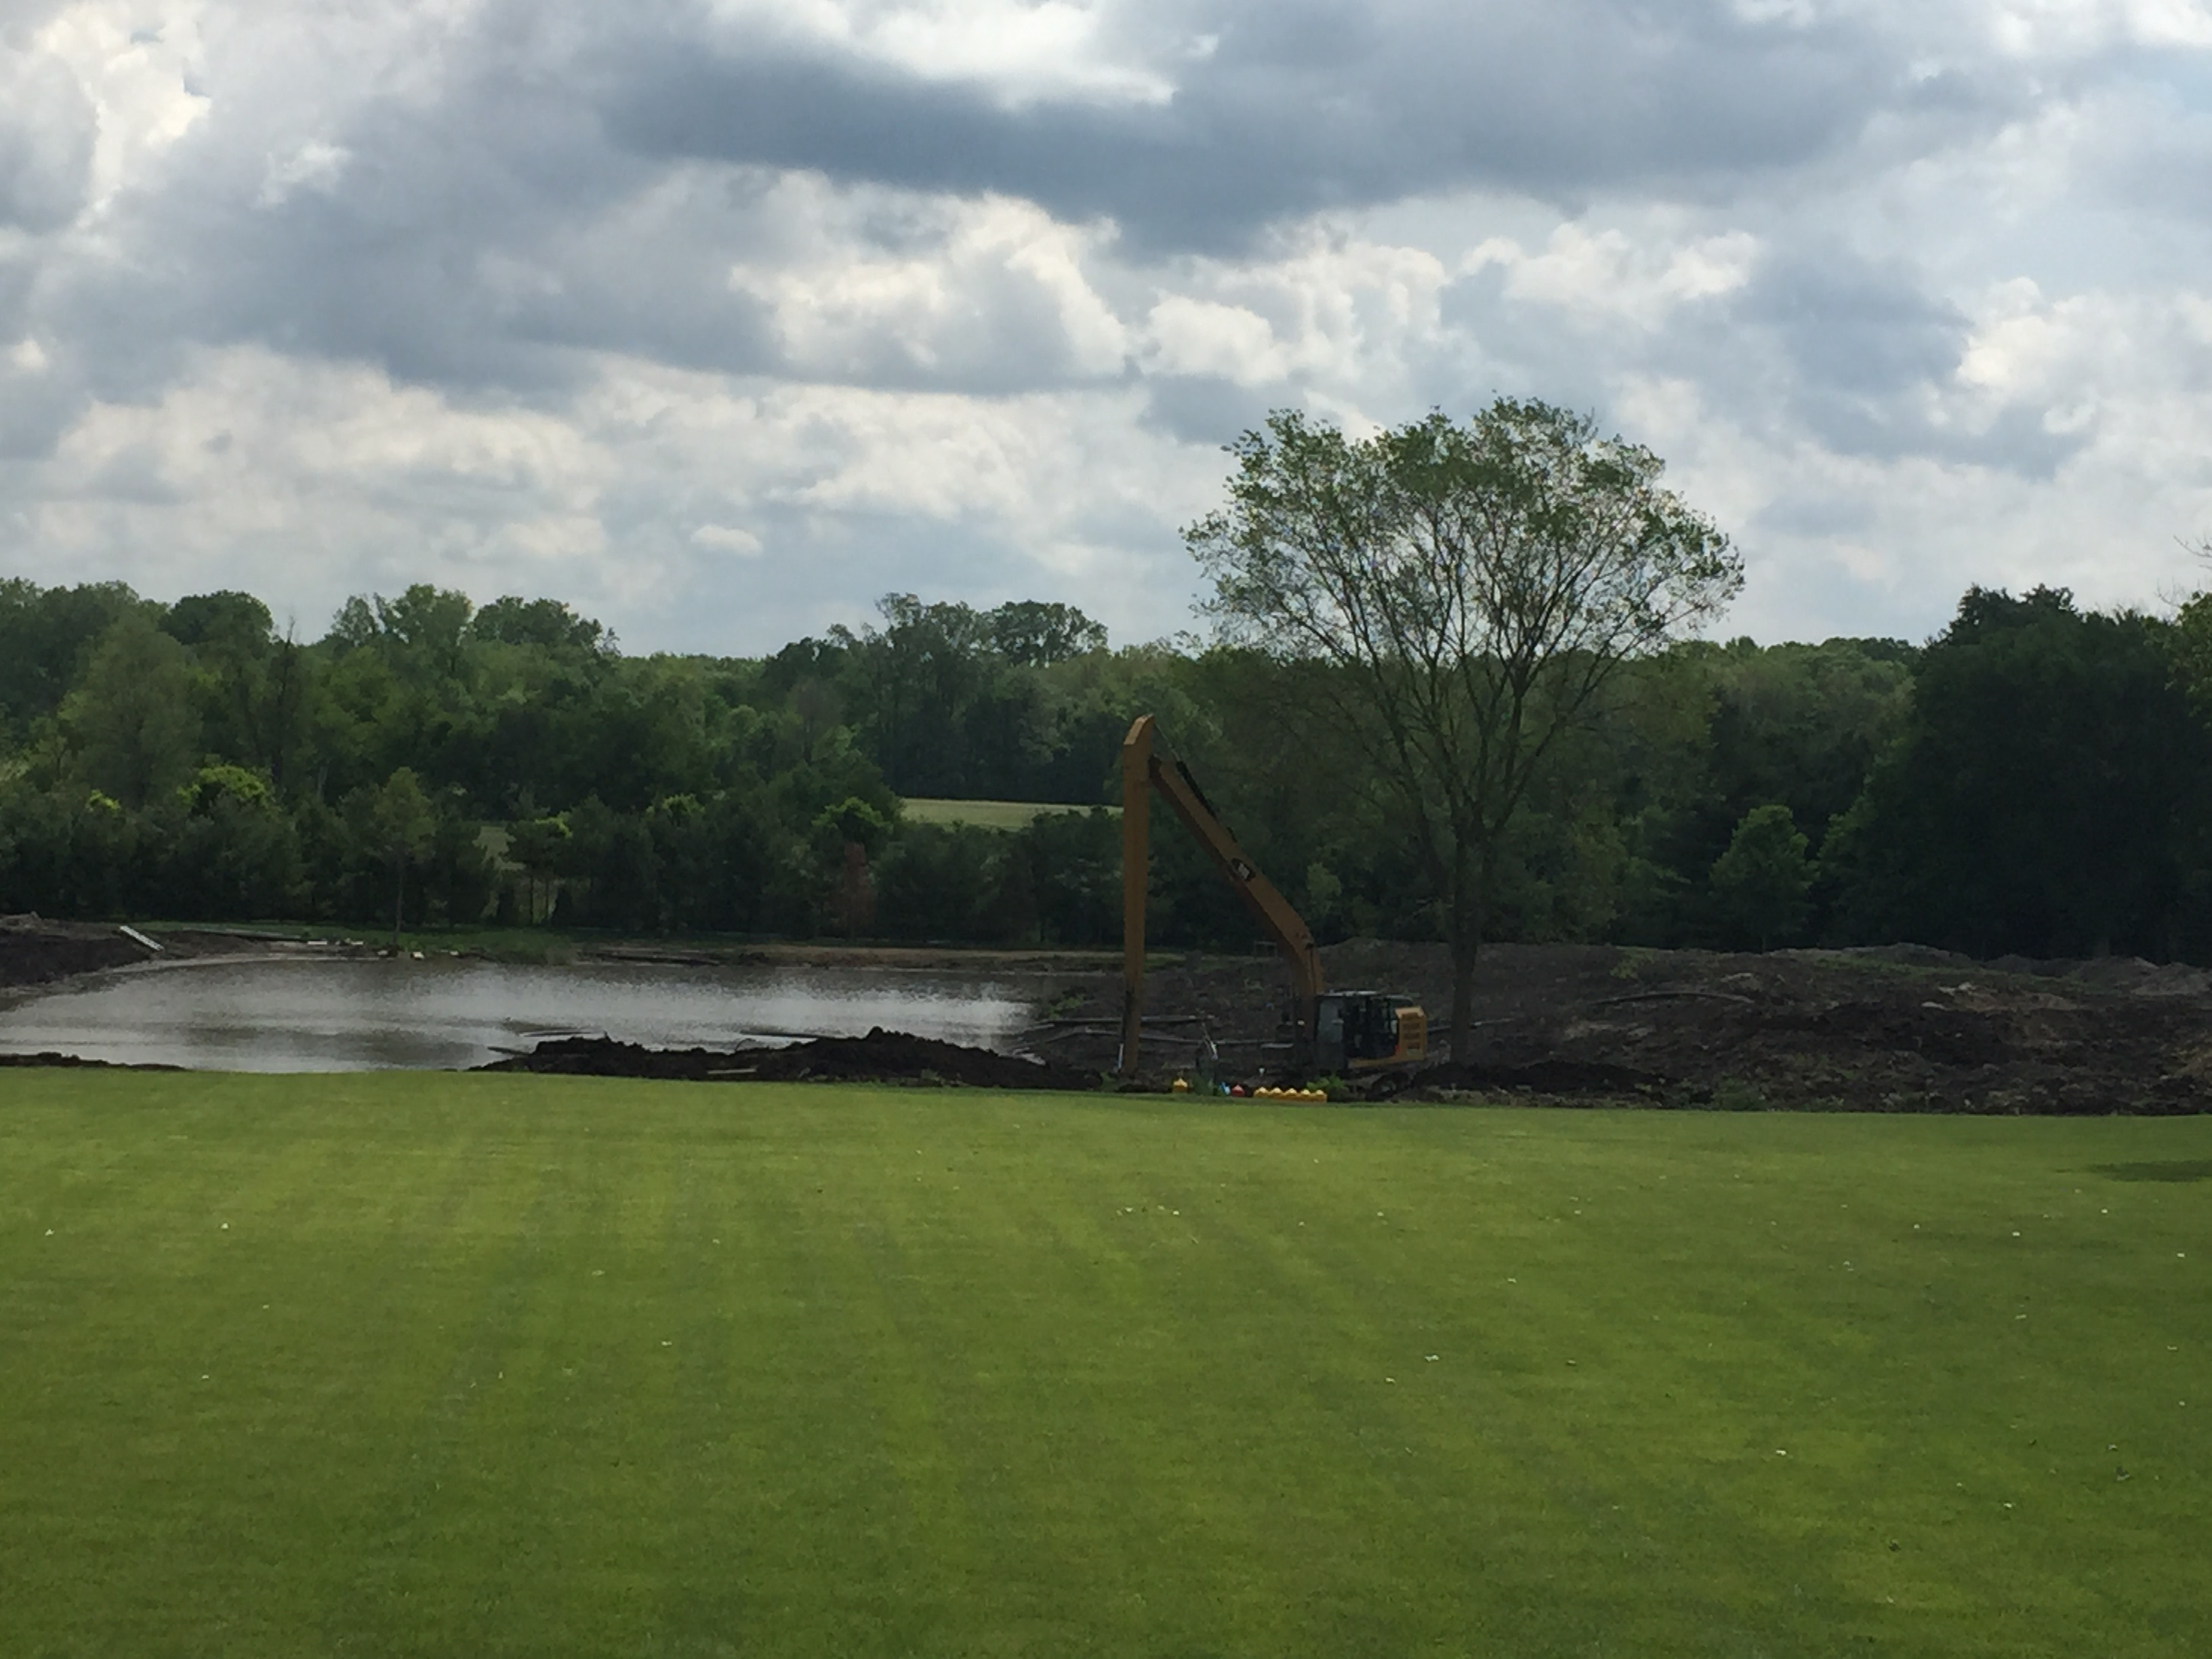 fish_pond_excavation_Plymouth_Michigan_412.jpg